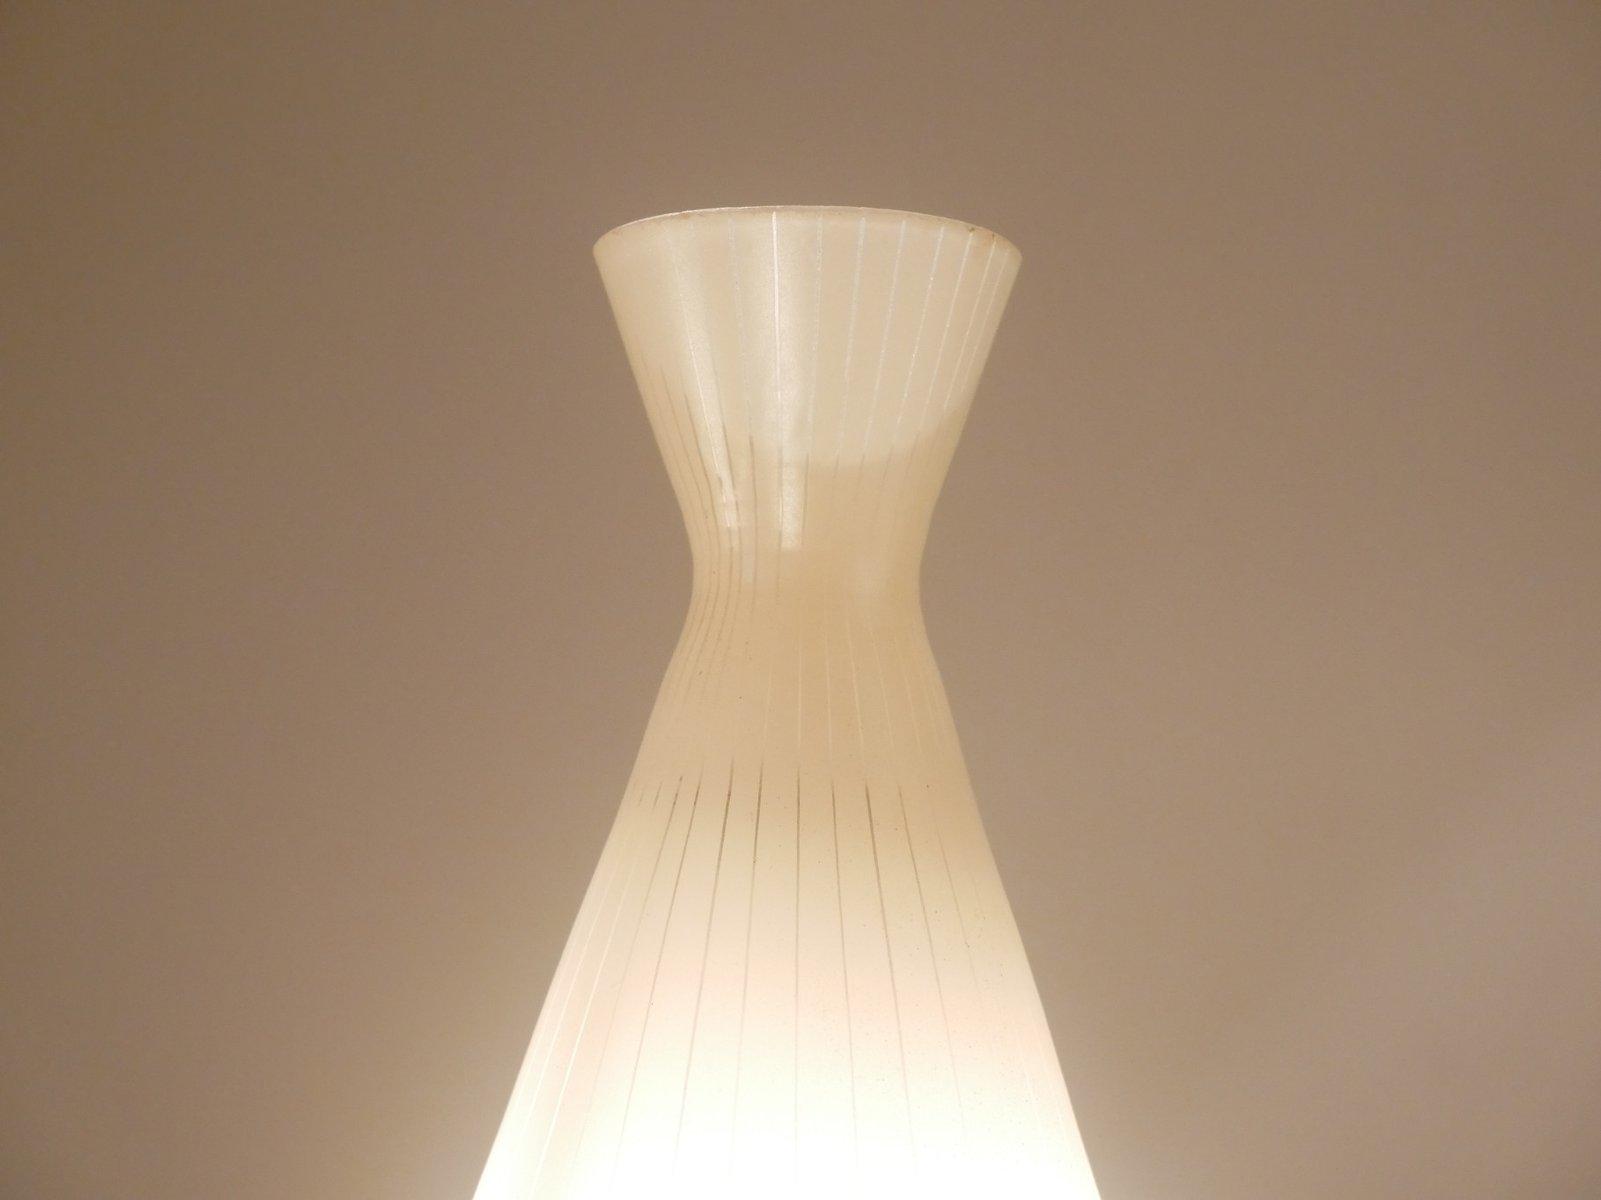 Lampadario In Legno Wood Mania : Lampada a sospensione tripla in vetro e teak di fog morup anni